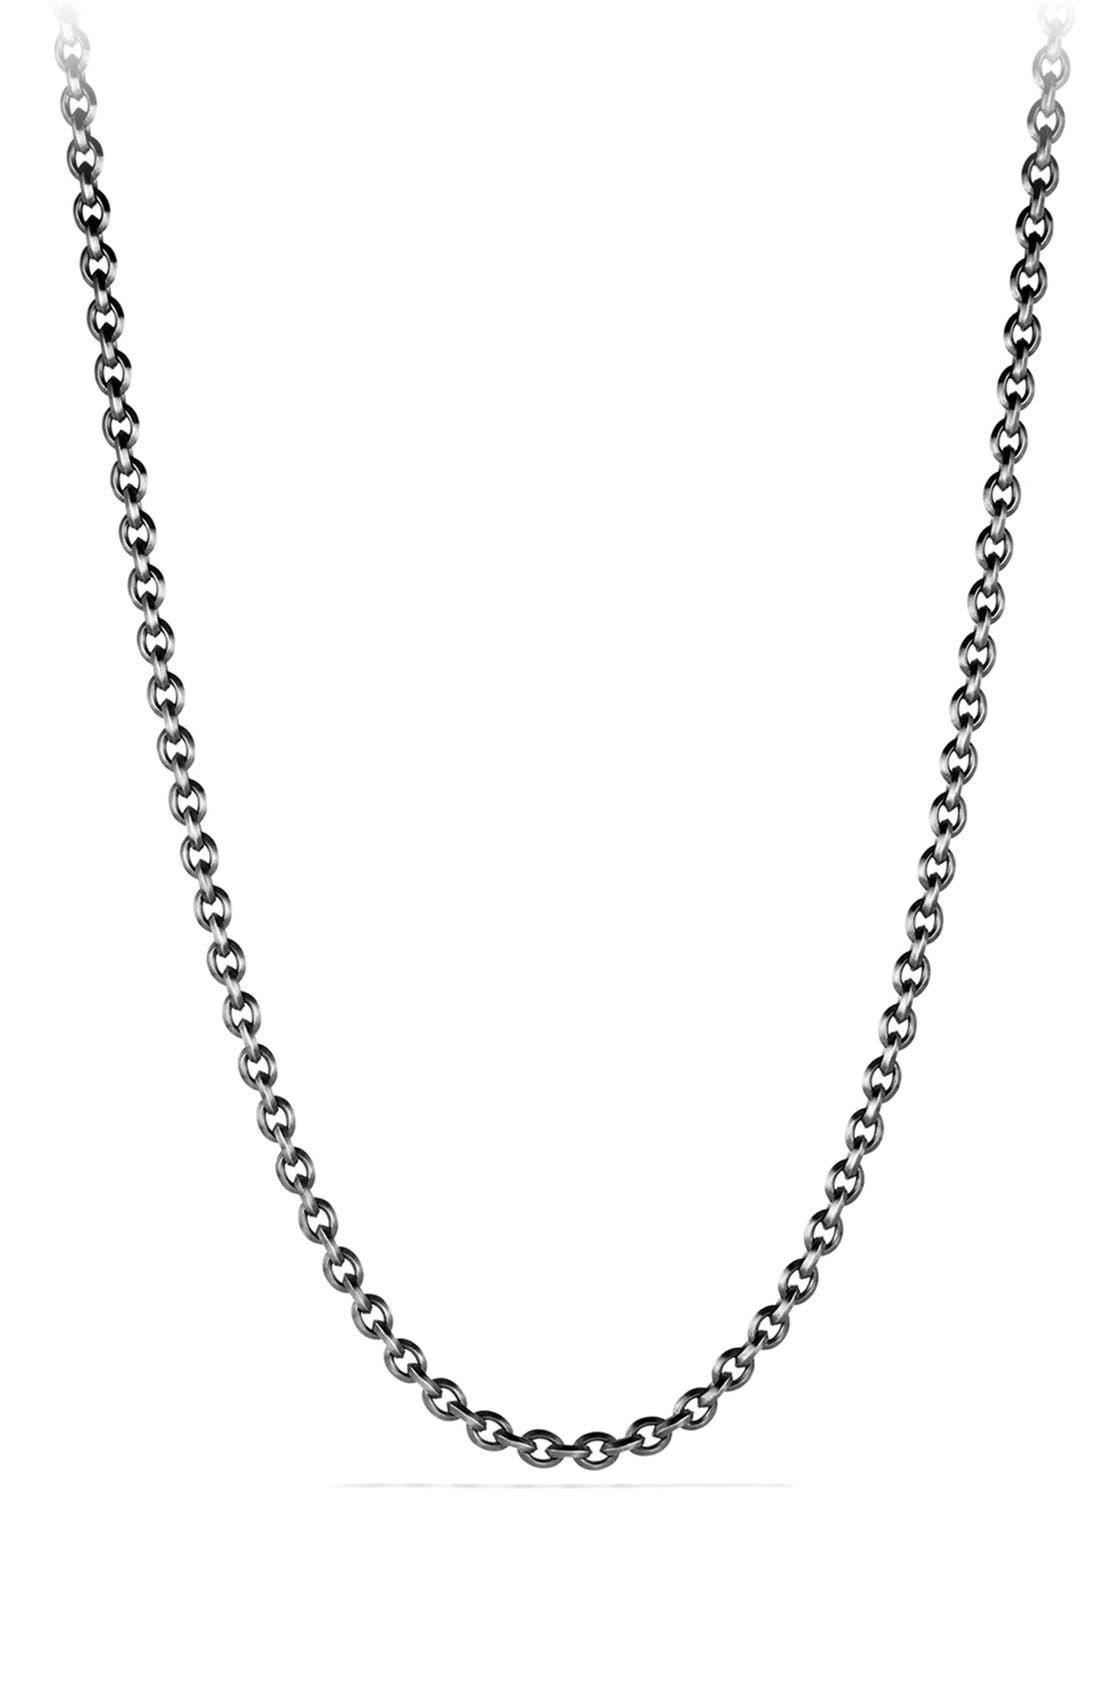 Alternate Image 1 Selected - David Yurman 'Knife Edge' Chain Necklace